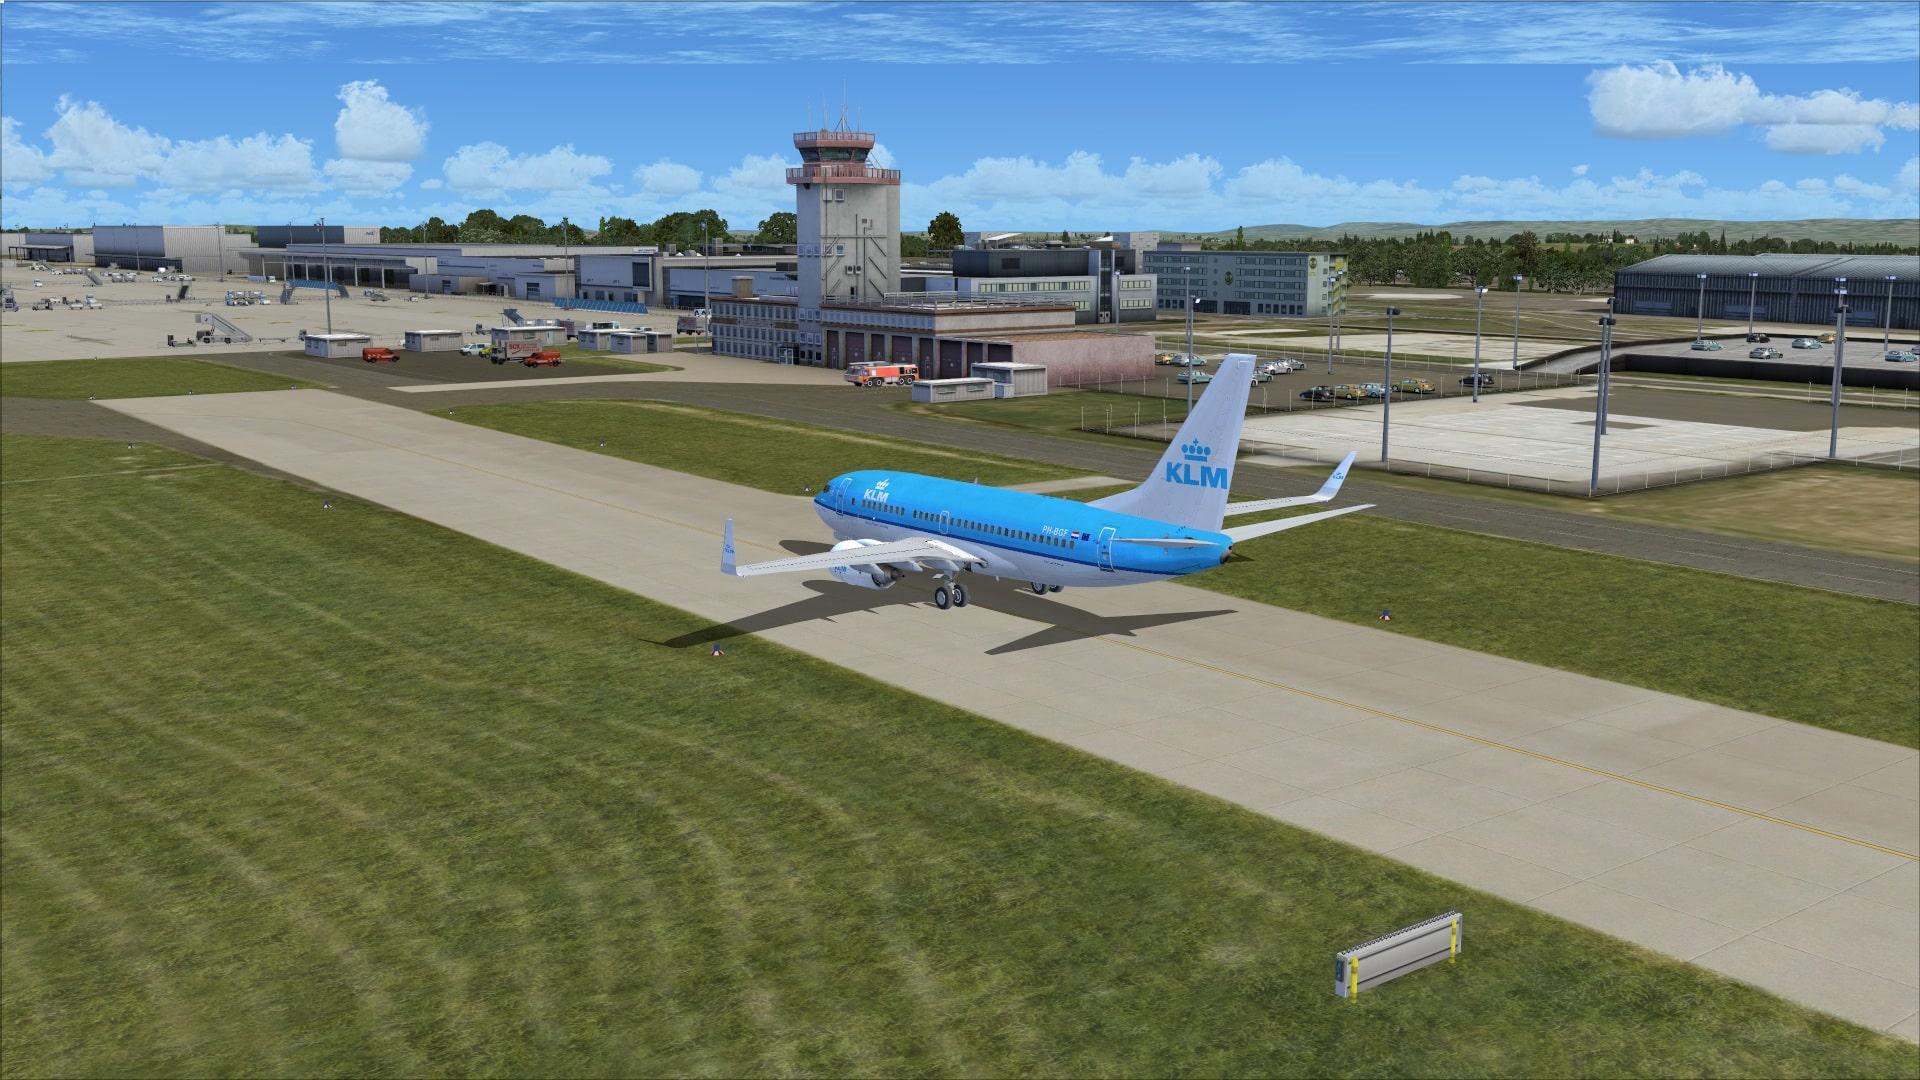 seaport airport traffic simulator - HD1920×1080